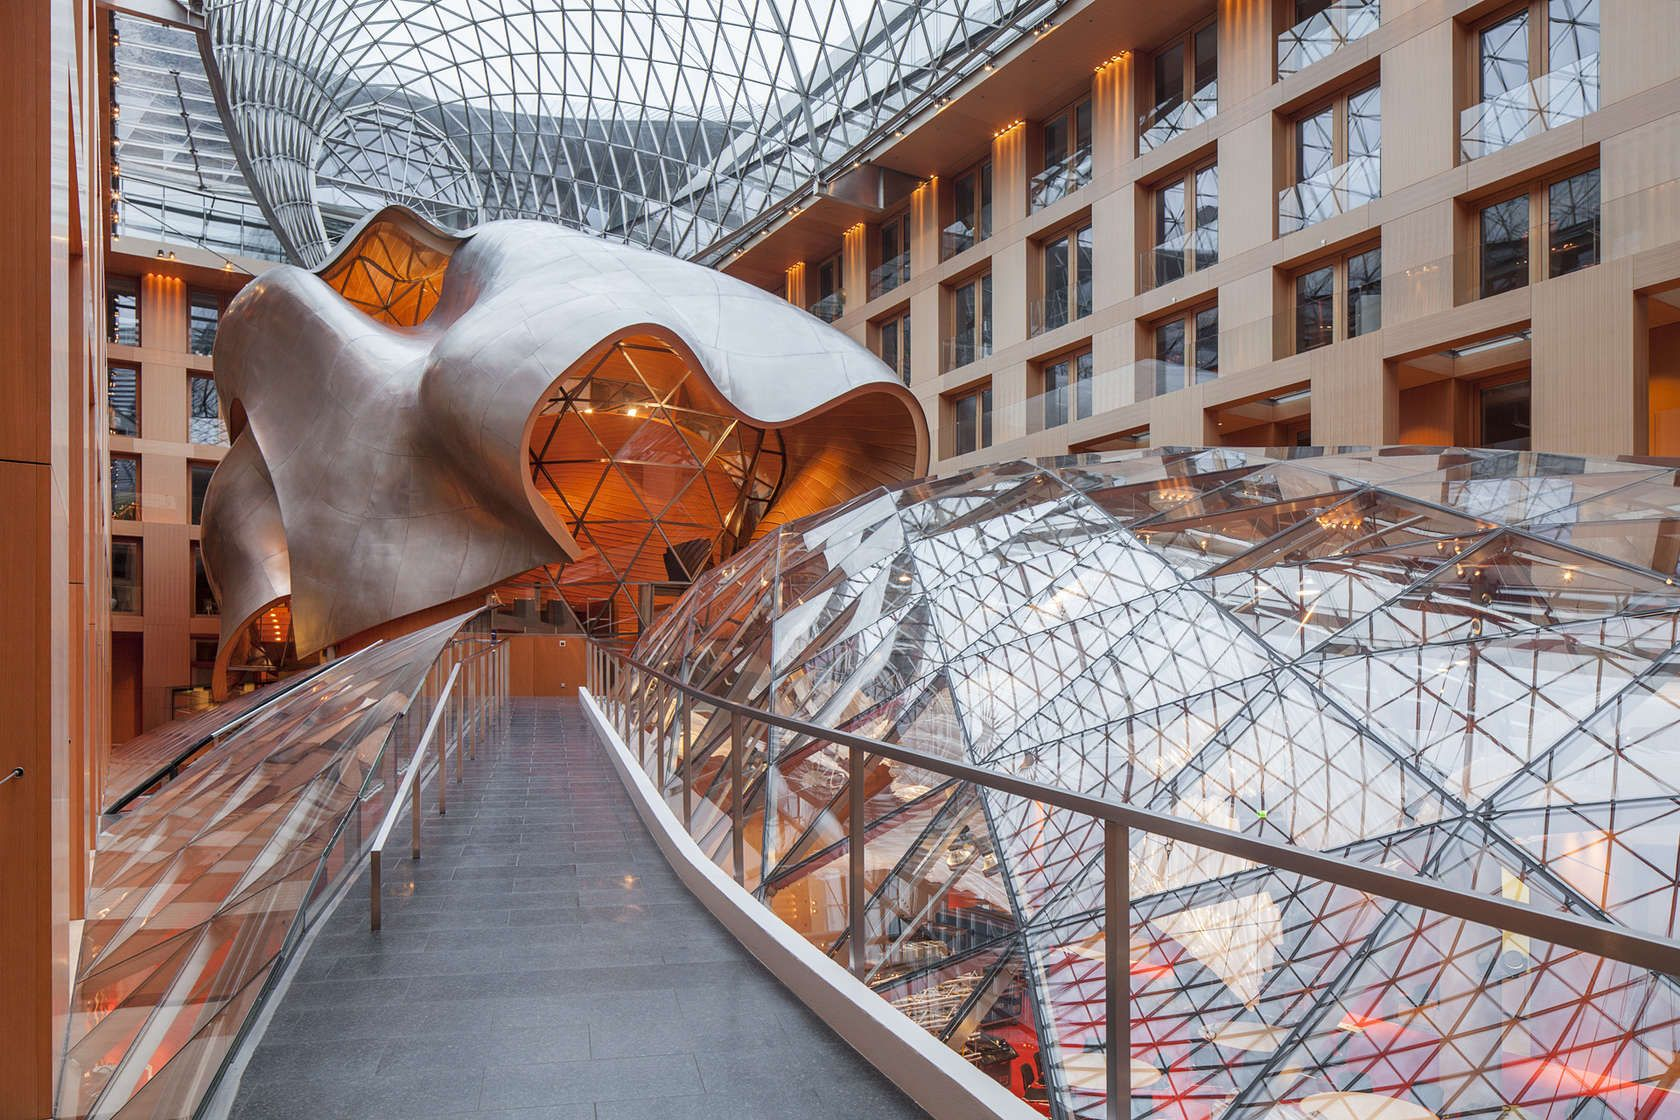 Dz Bank Berlin Banks Building Architecture Architecture Photography